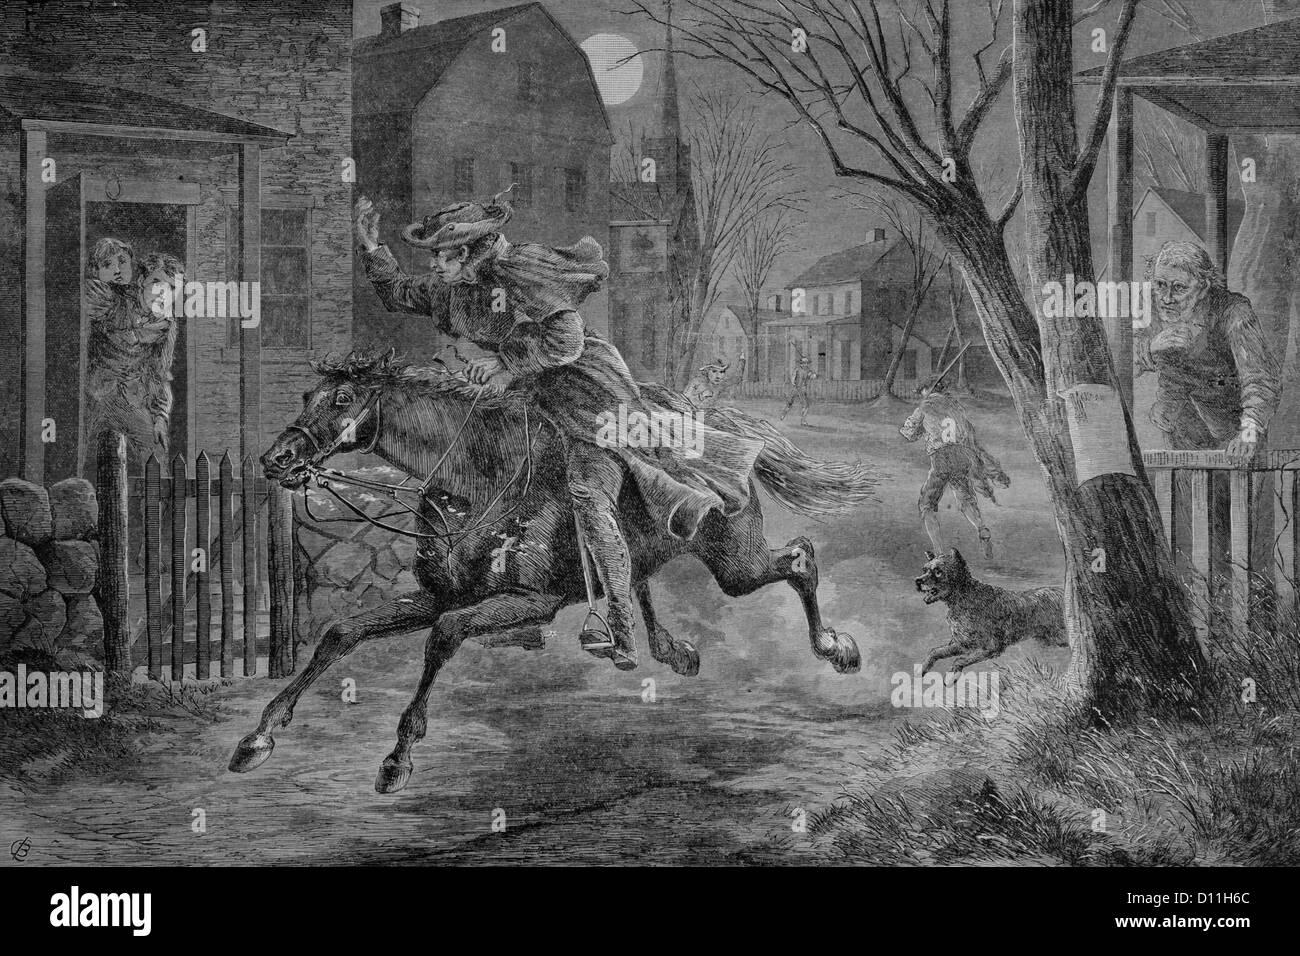 DER 1770ER JAHRE 19. APRIL 1775 ILLUSTRATION MITTERNACHT-FAHRT VON PAUL REVERE Stockbild